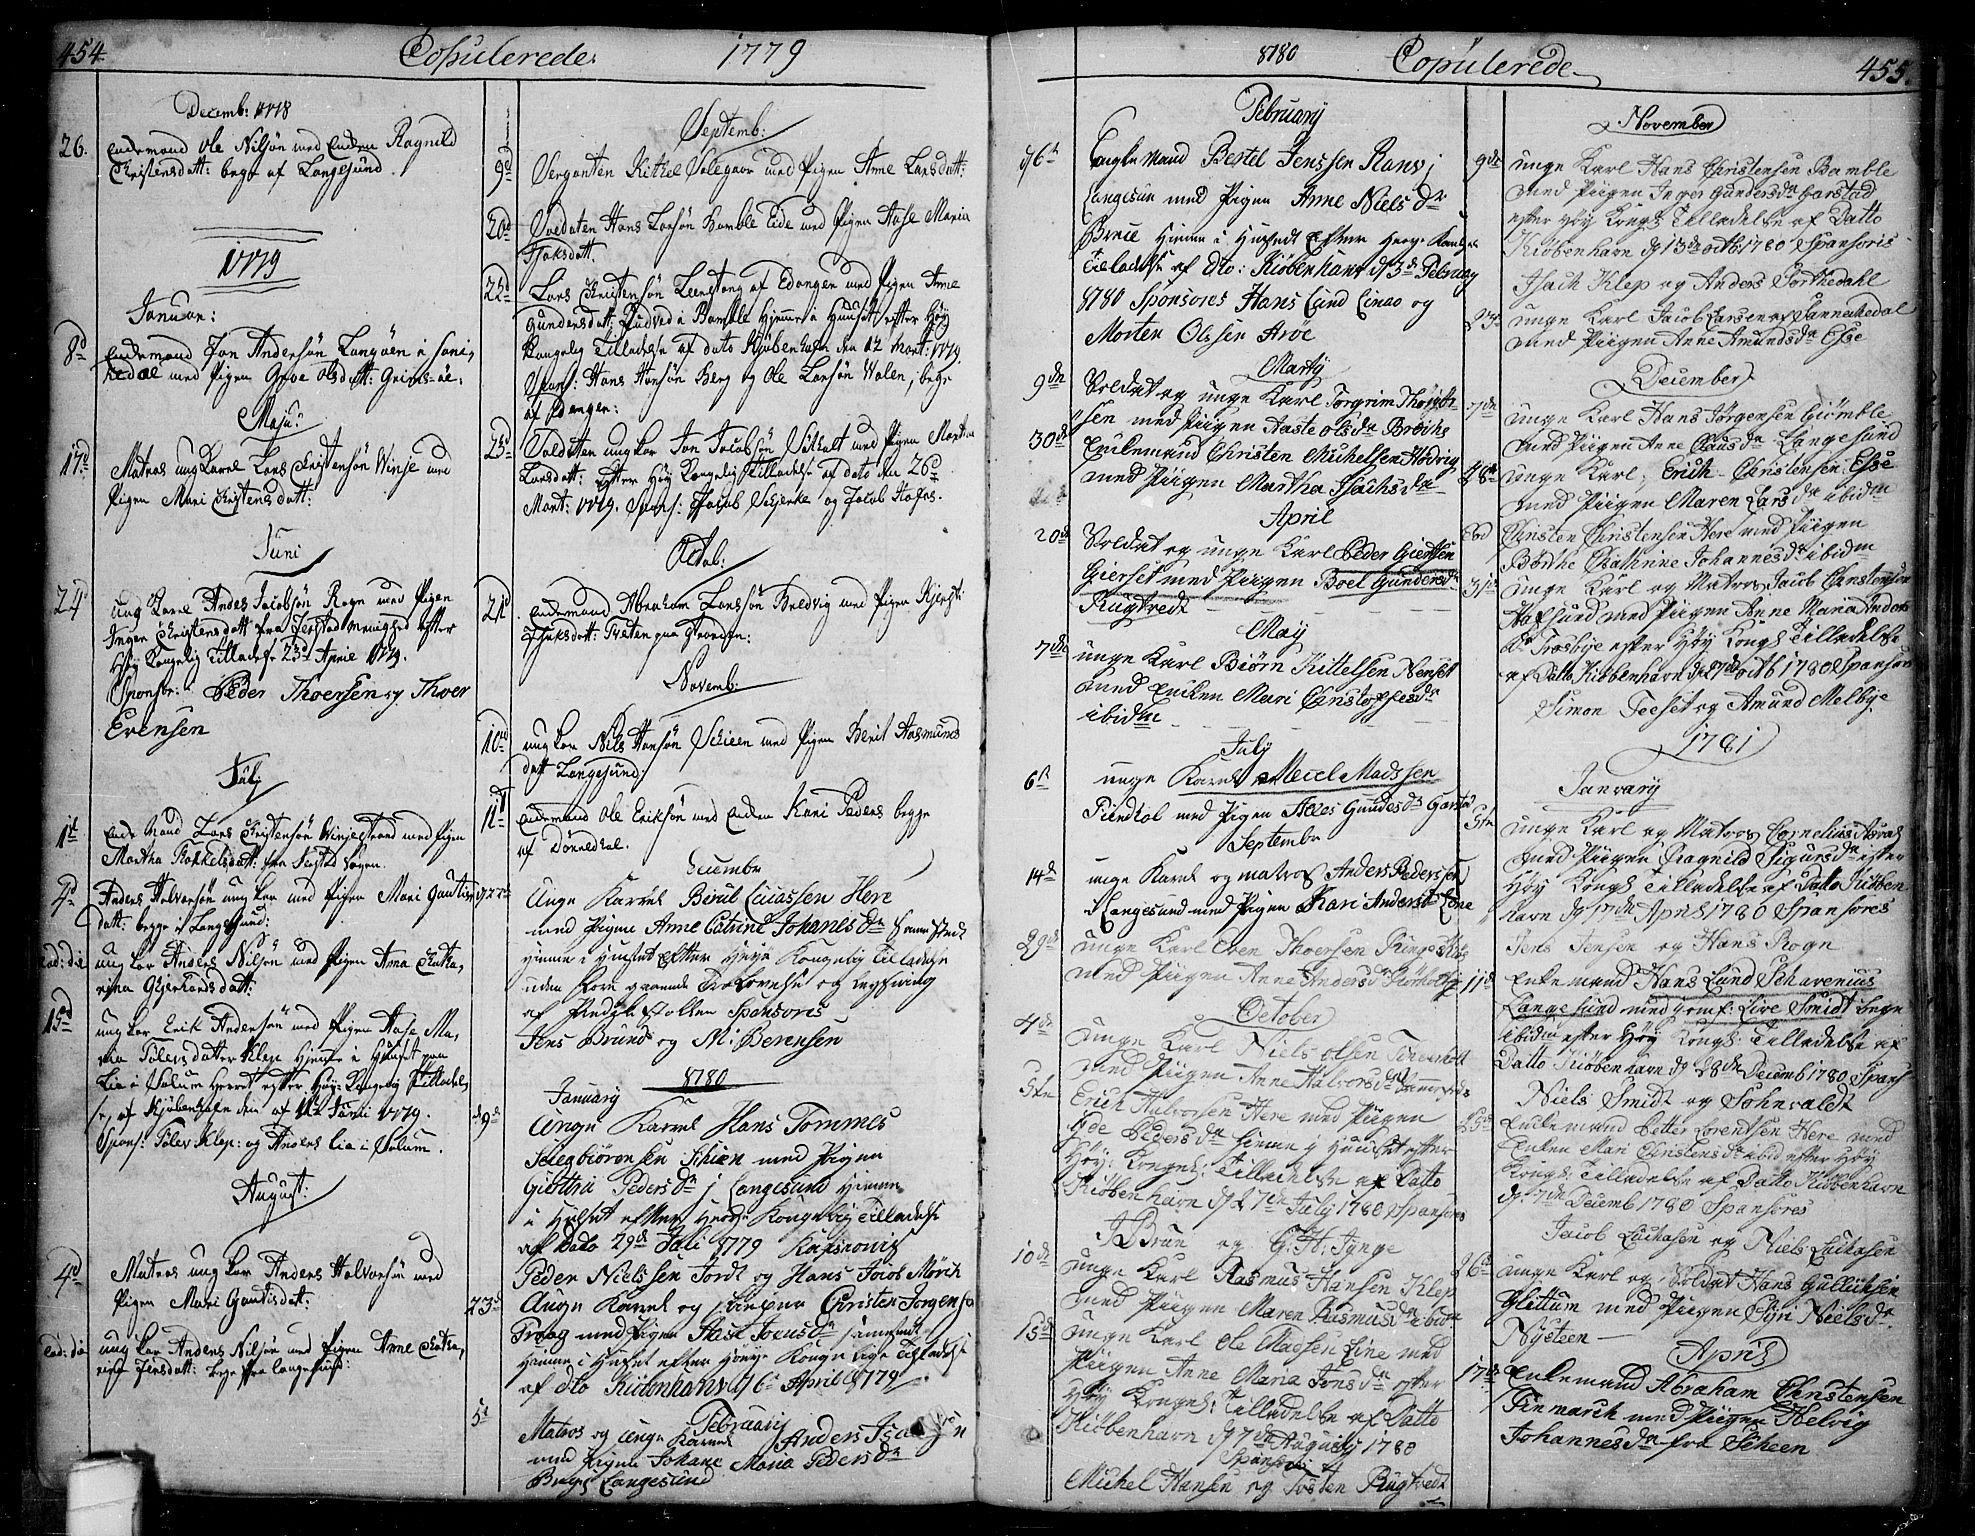 SAKO, Bamble kirkebøker, F/Fa/L0002: Ministerialbok nr. I 2, 1775-1814, s. 454-455